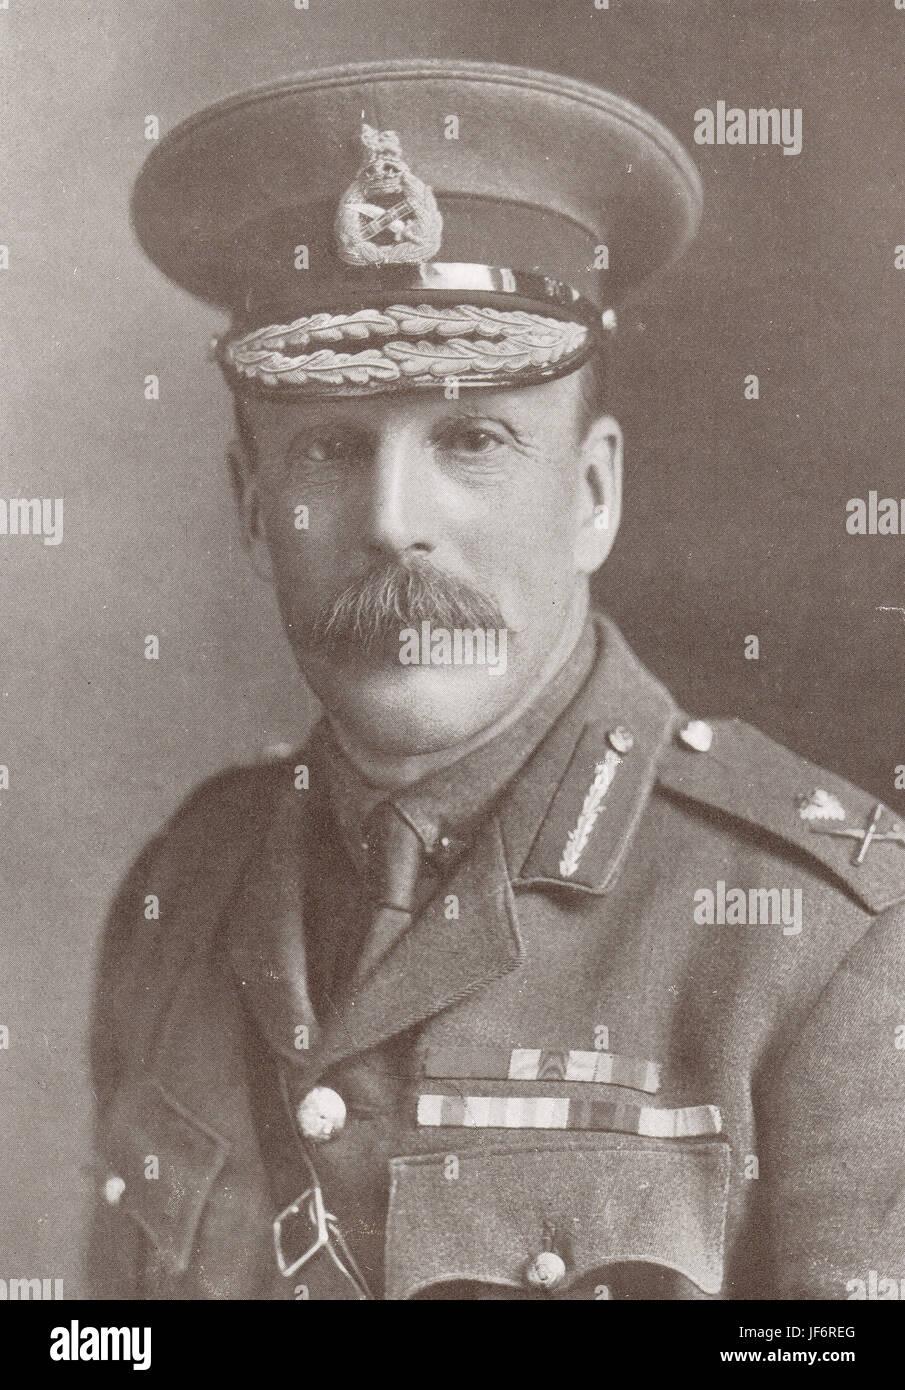 General Maude conqueror of Baghdad, 1917 - Stock Image